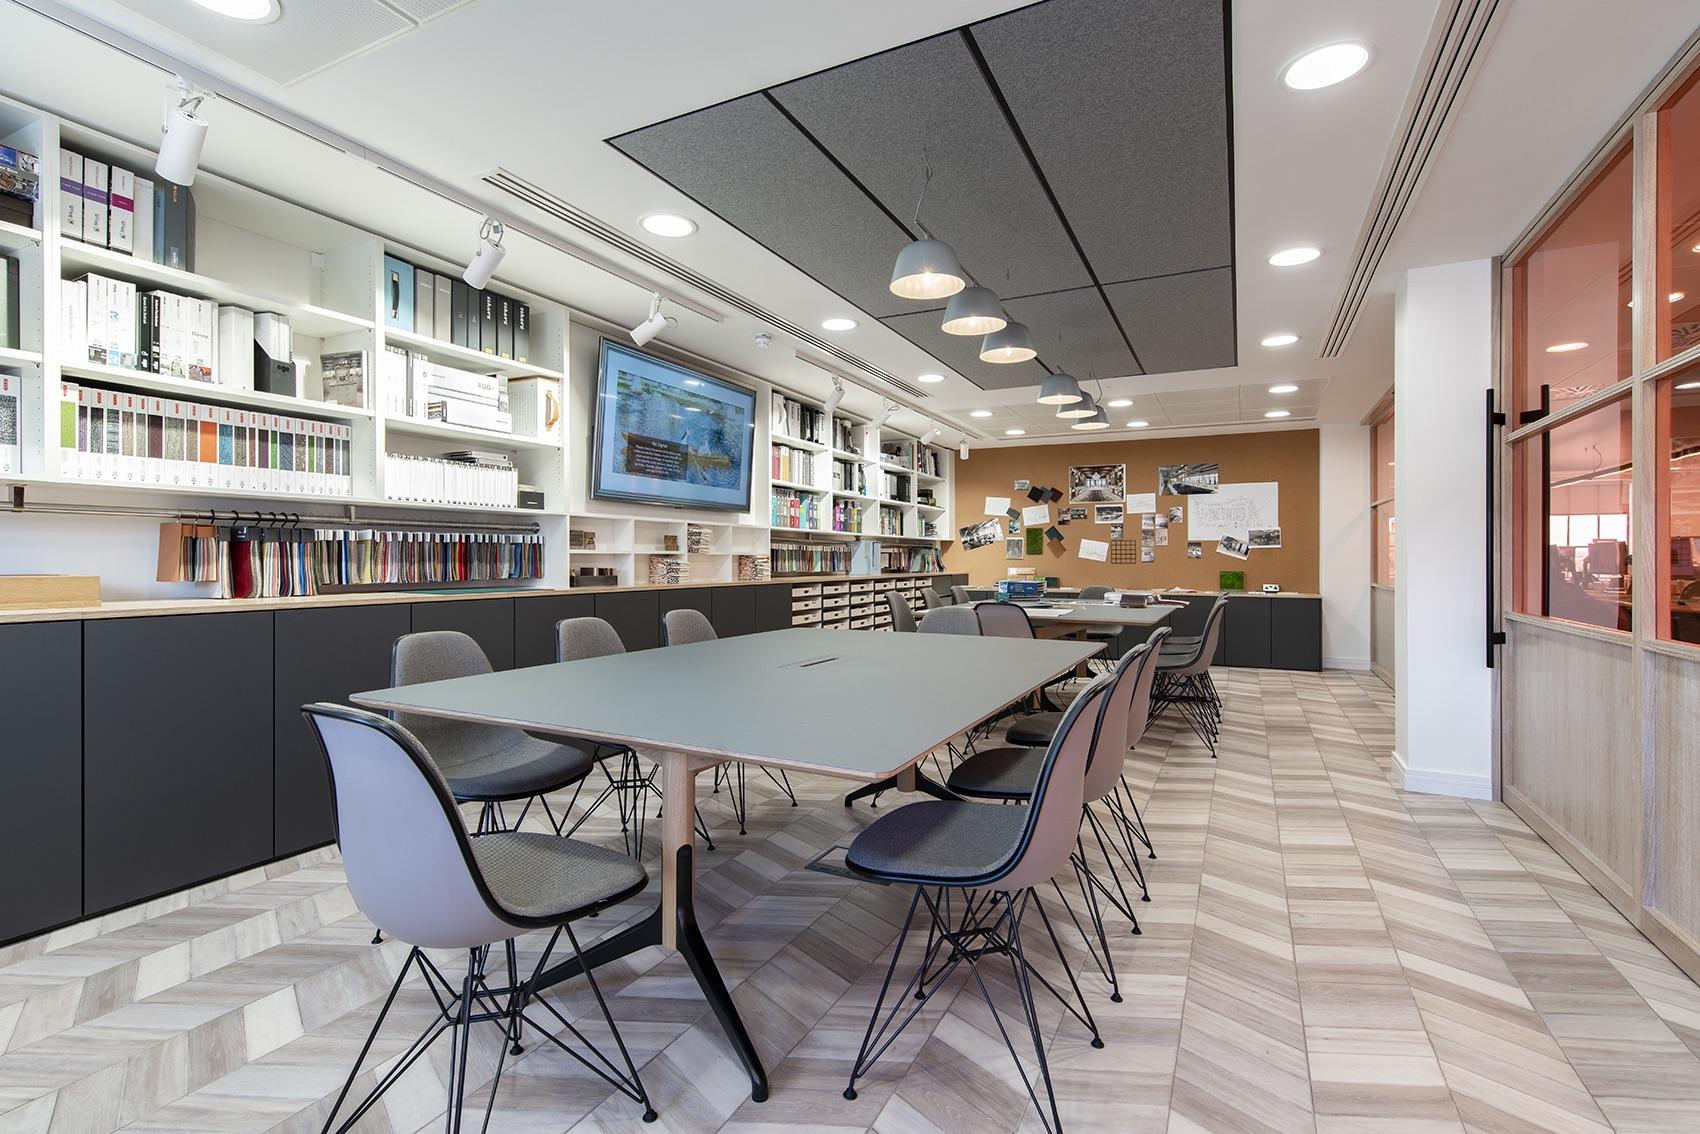 peldon-rose-new-office-london-11